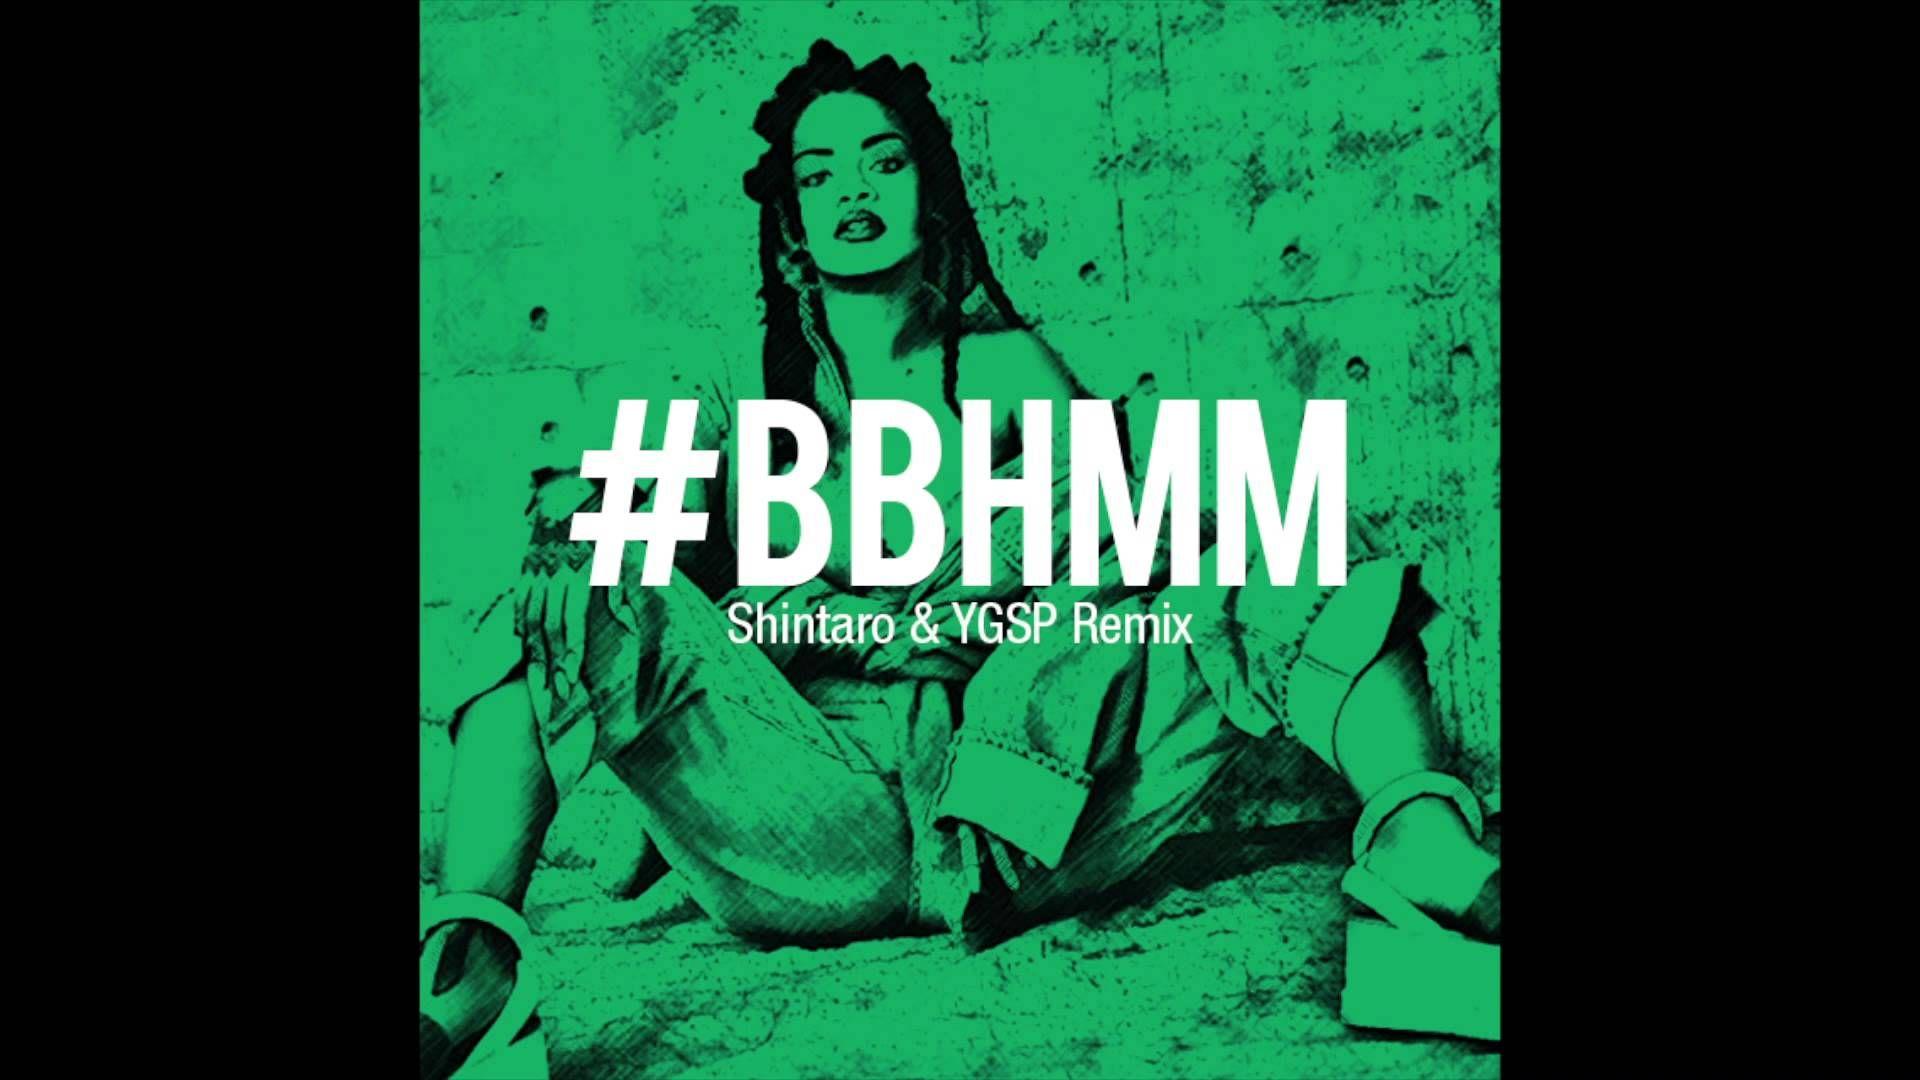 Bbhmm Shintaro Ygsp Remix Rihanna Remix Music Artists Rihanna